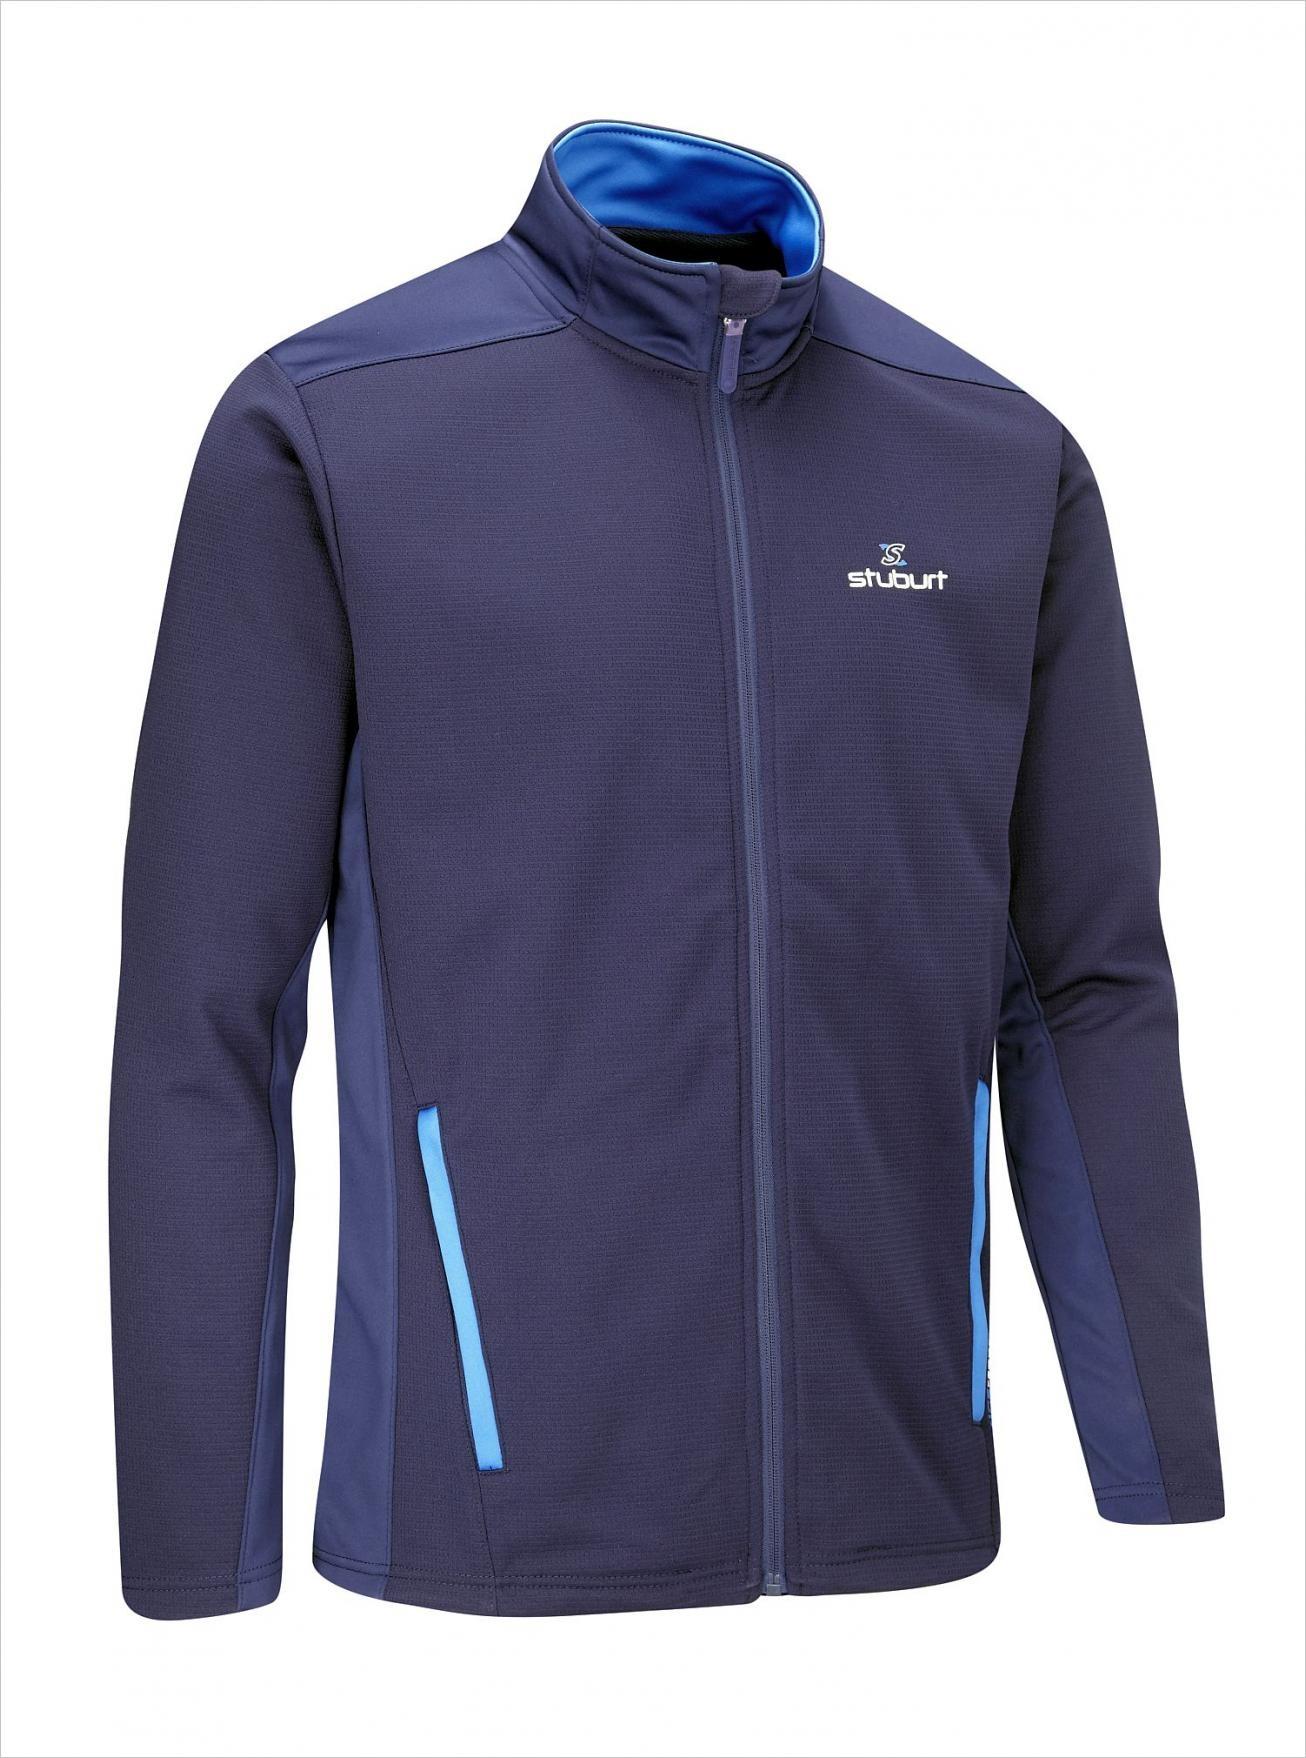 Stuburt Endurance Full Zip Fleece Heren Golf Trui - Midnight Blauw